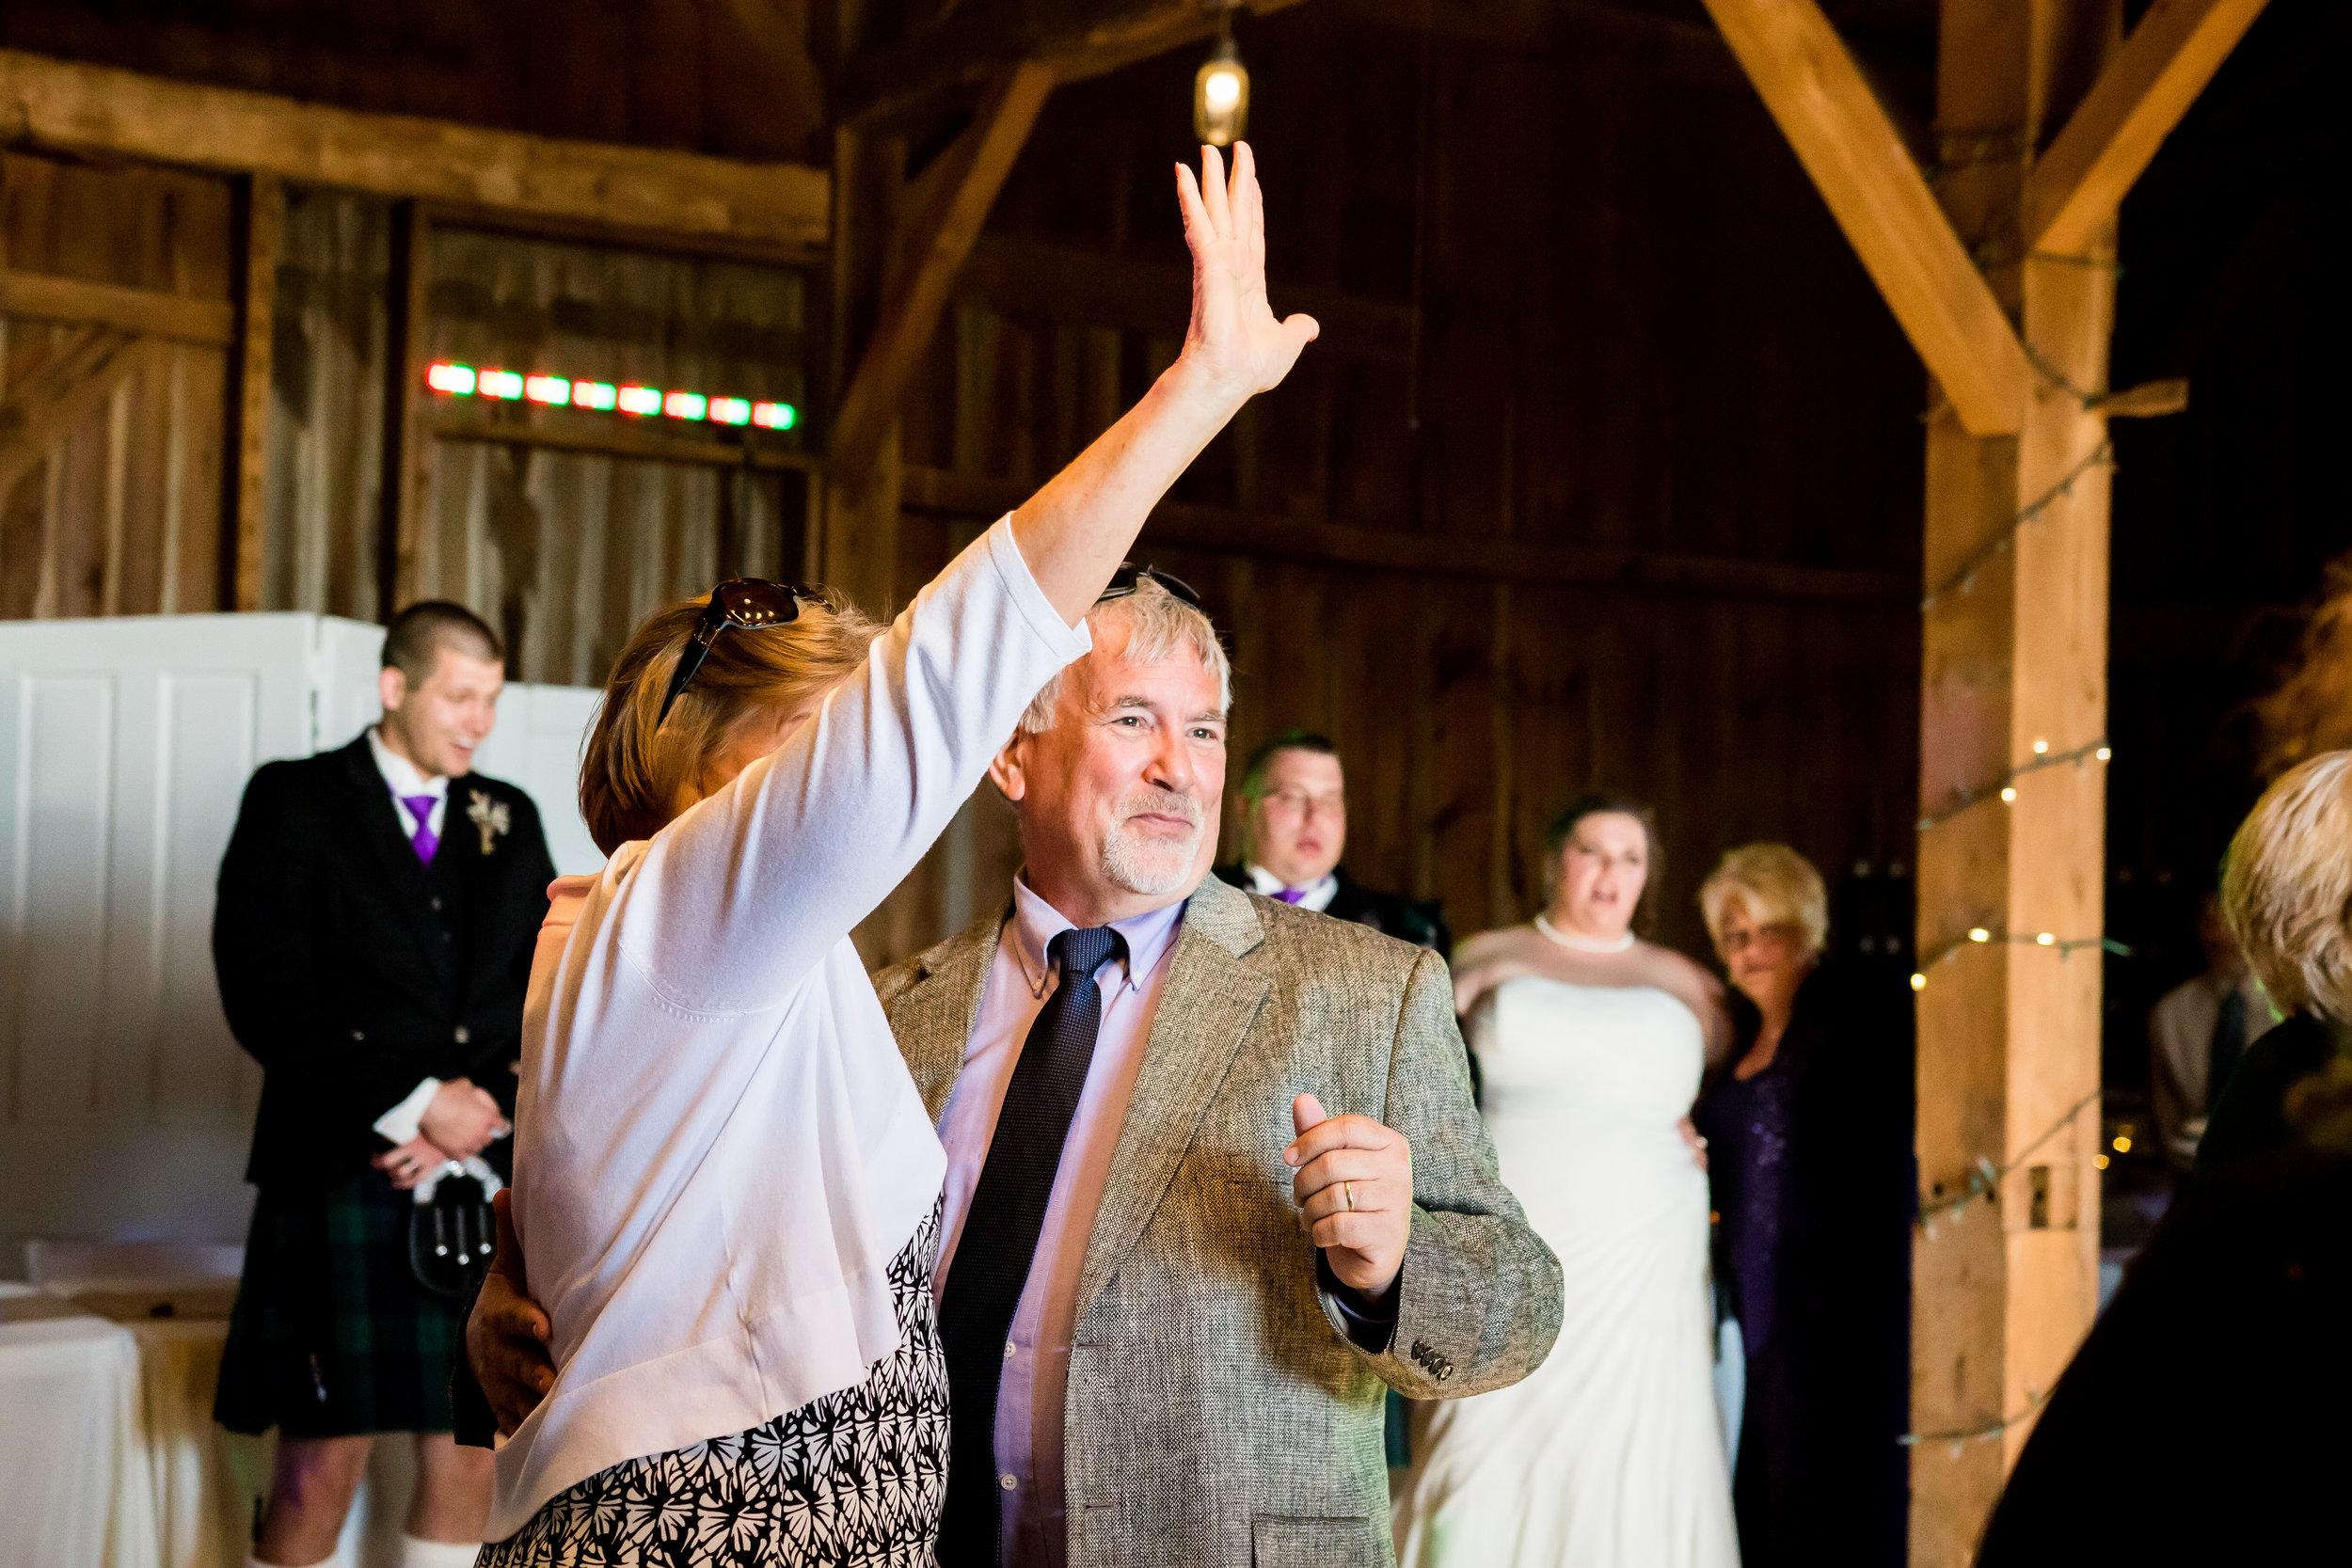 Indiana_Wedding_Photography_Zacharaiah-971.jpg